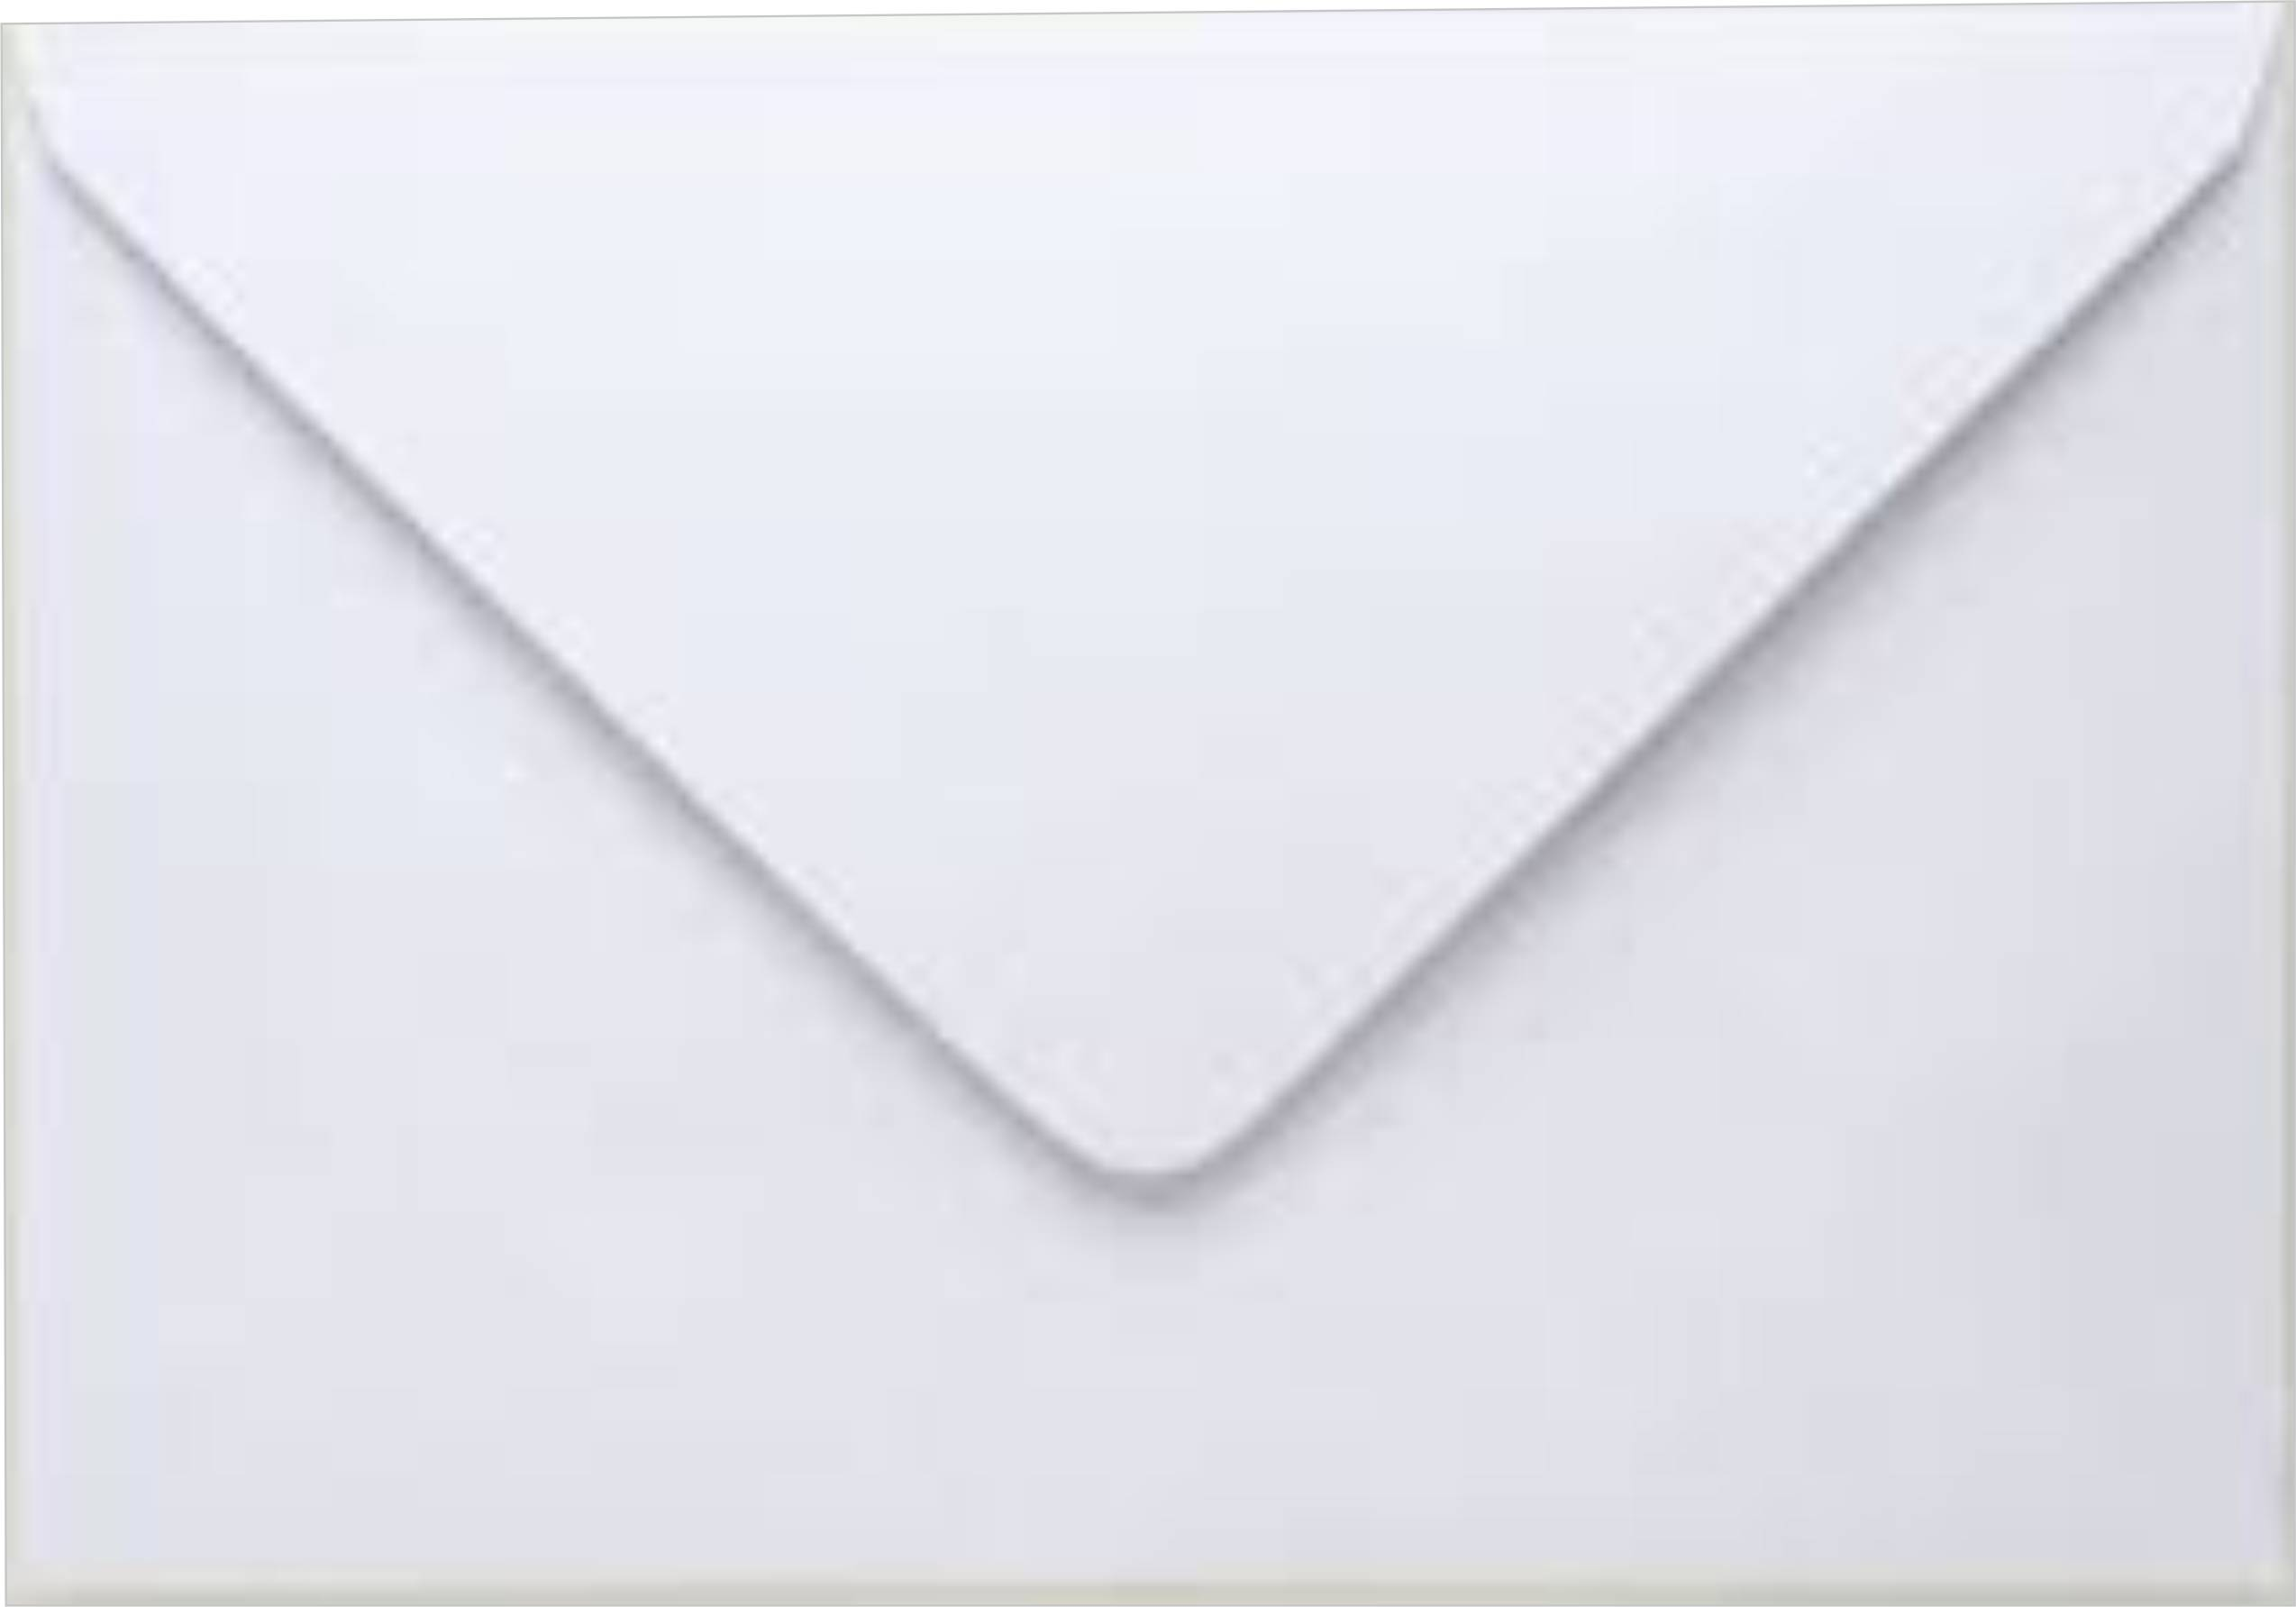 16x16 Davetiye Zarfı - 100 Adet